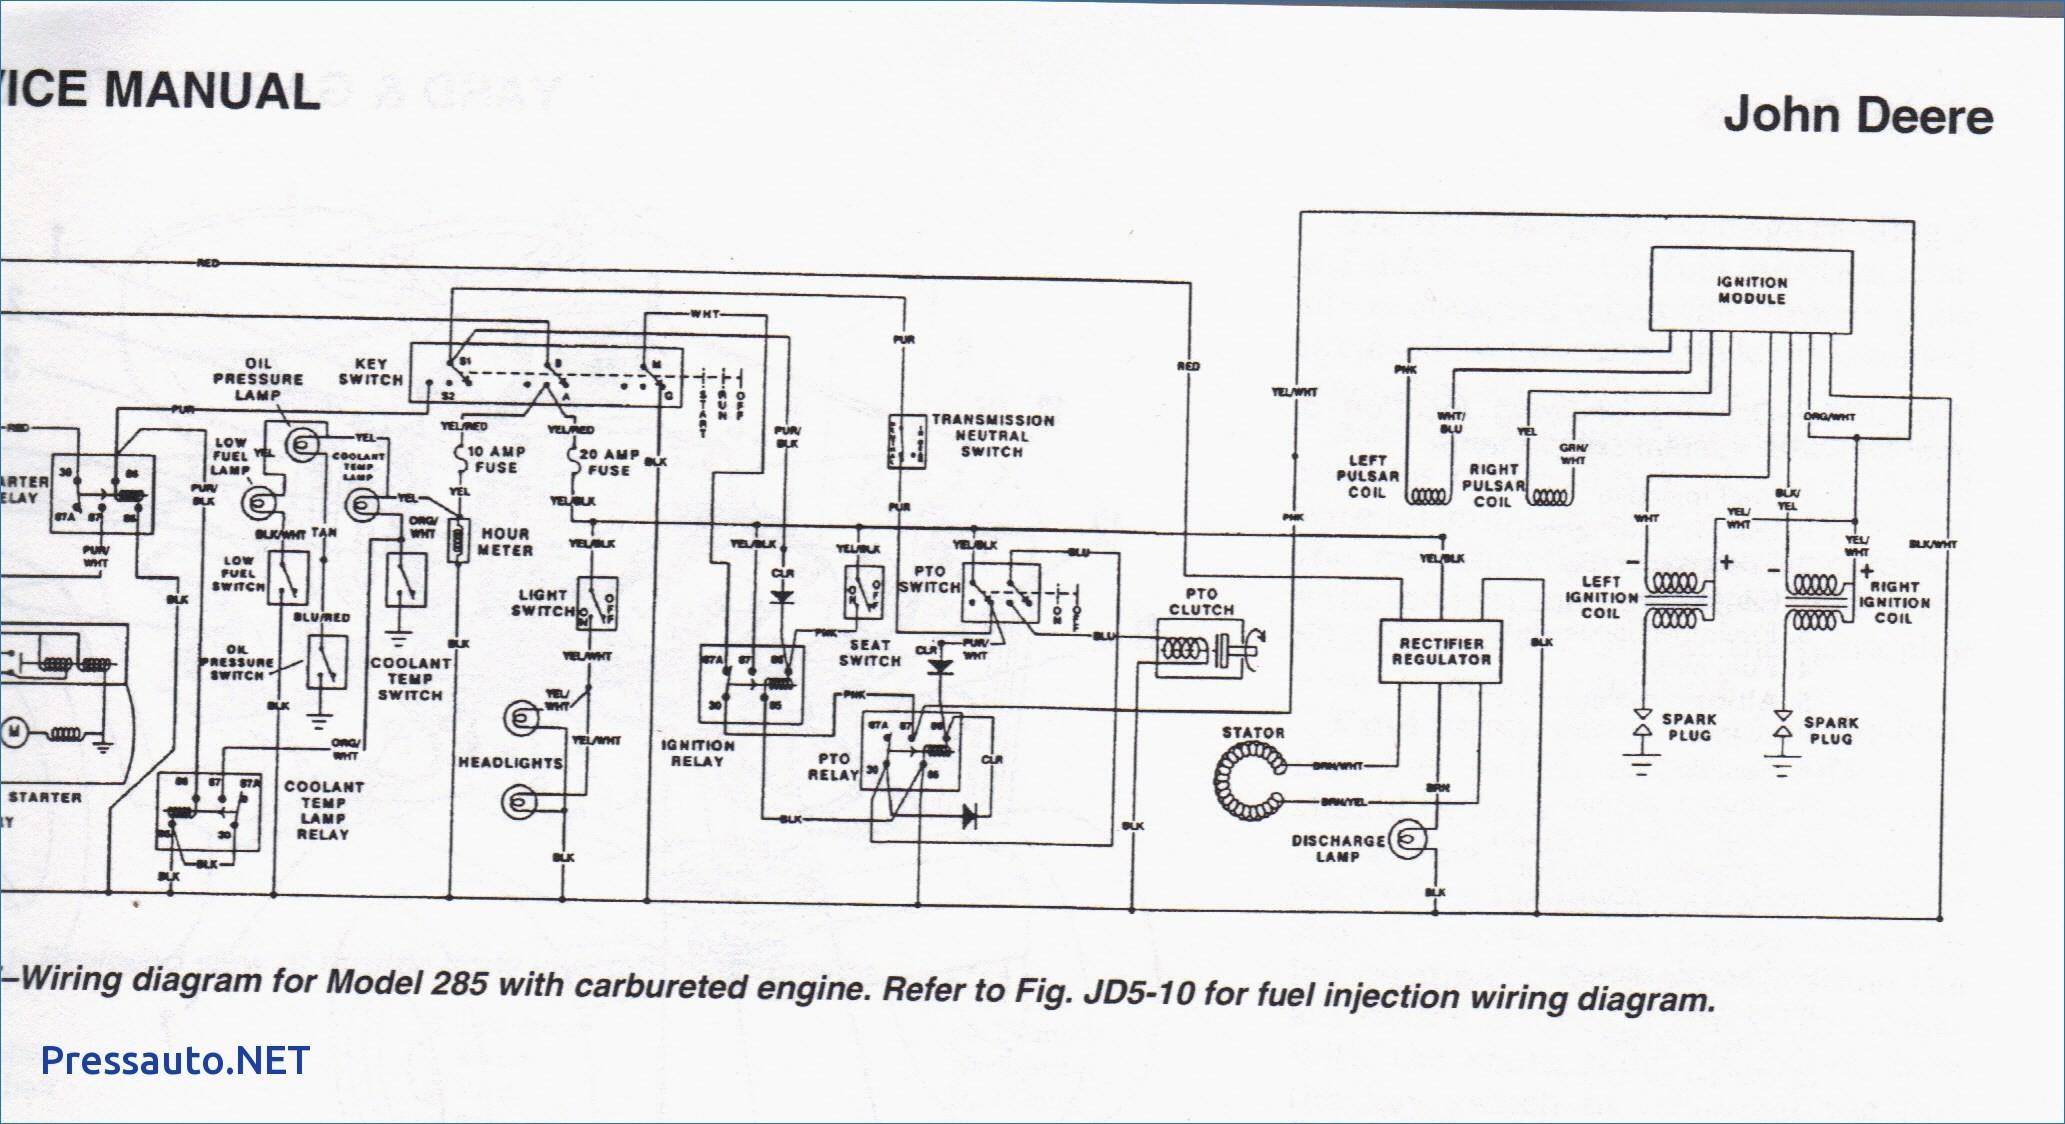 john deere la145 wiring diagram 3 phase ac compressor wiring diagram washer extractor parts manual unimac